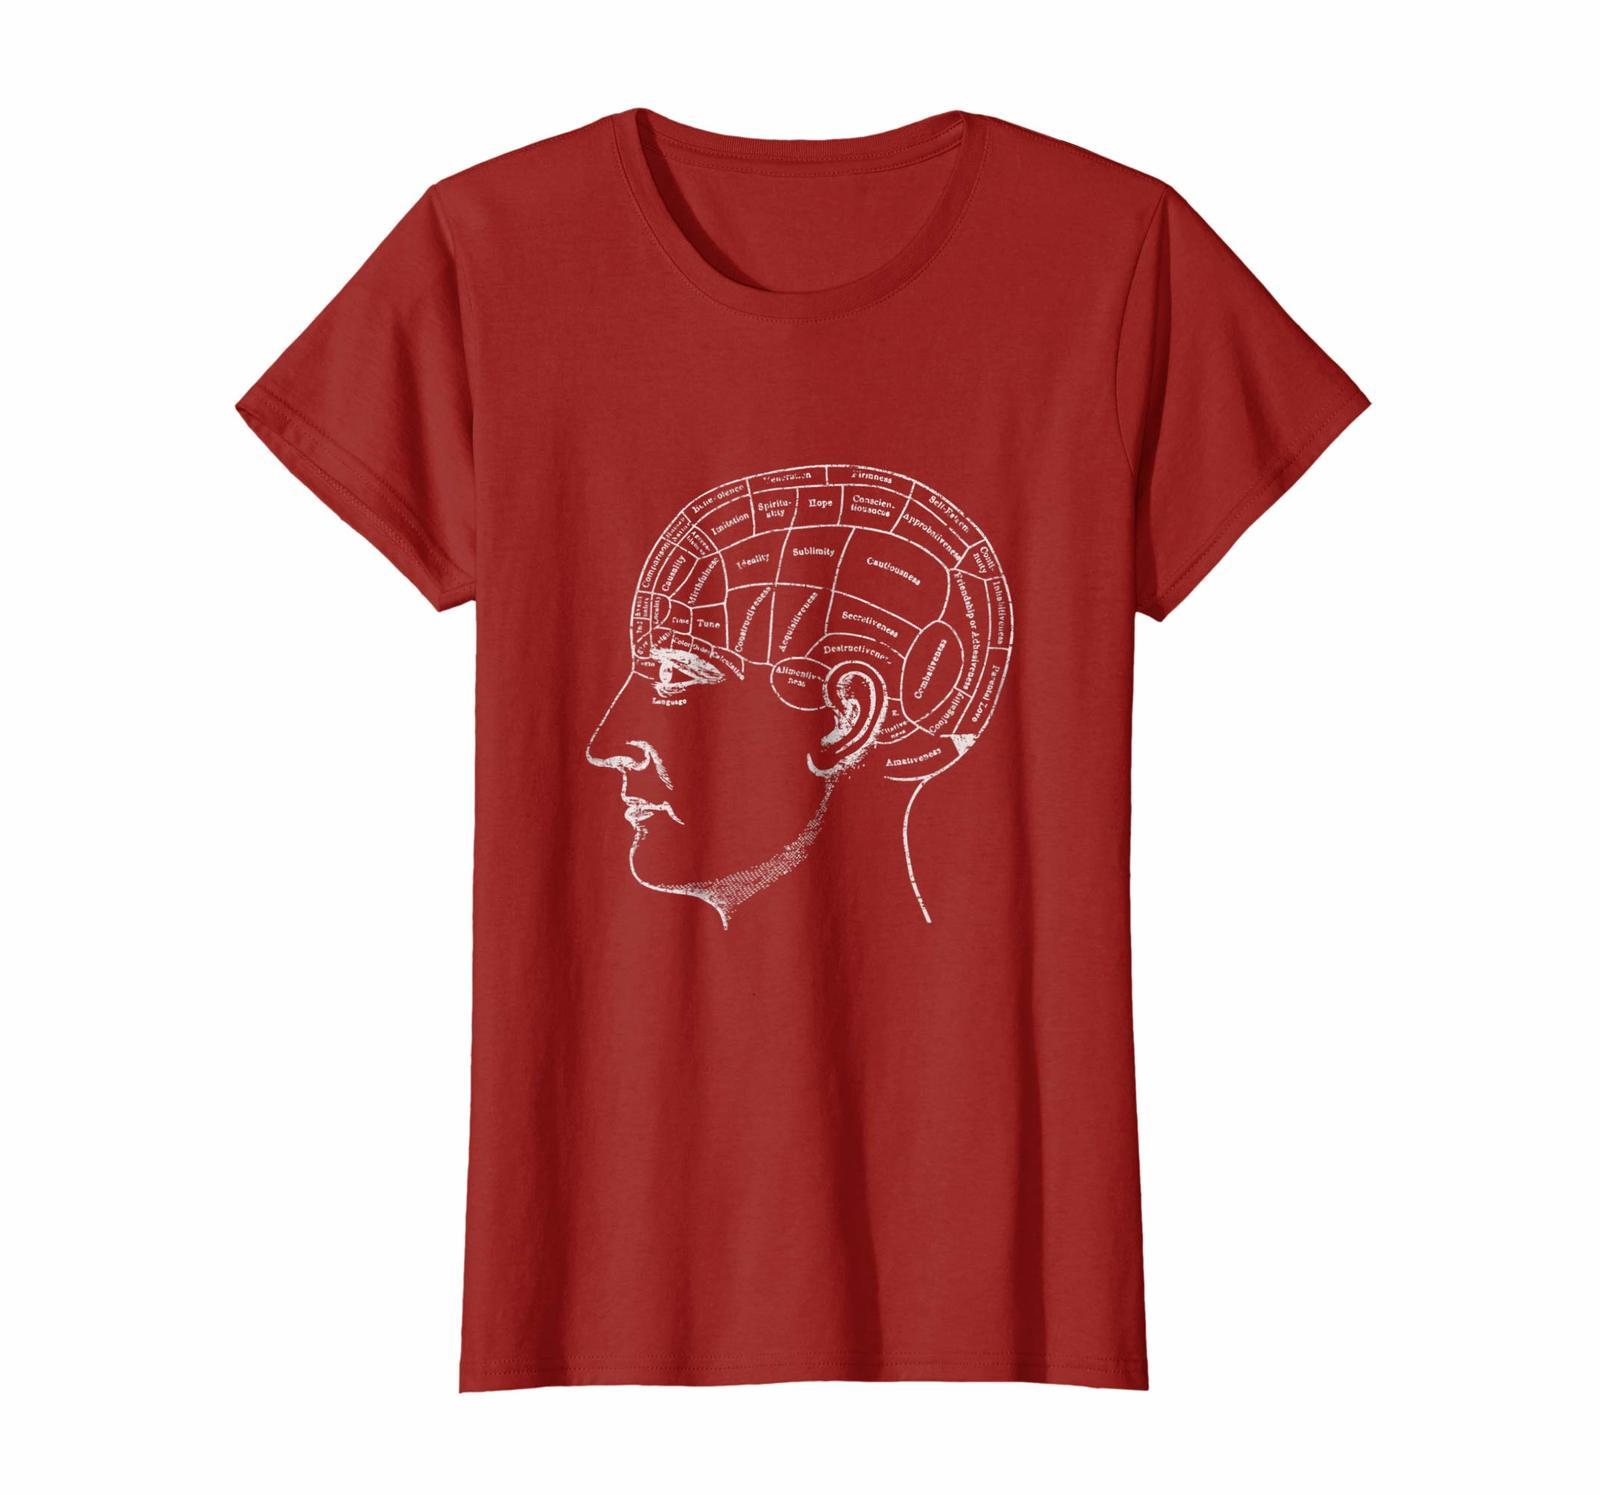 Funny Tee - Vintage Anatomy Shirt - Phrenology Psychology Brain T-Shirt Wowen